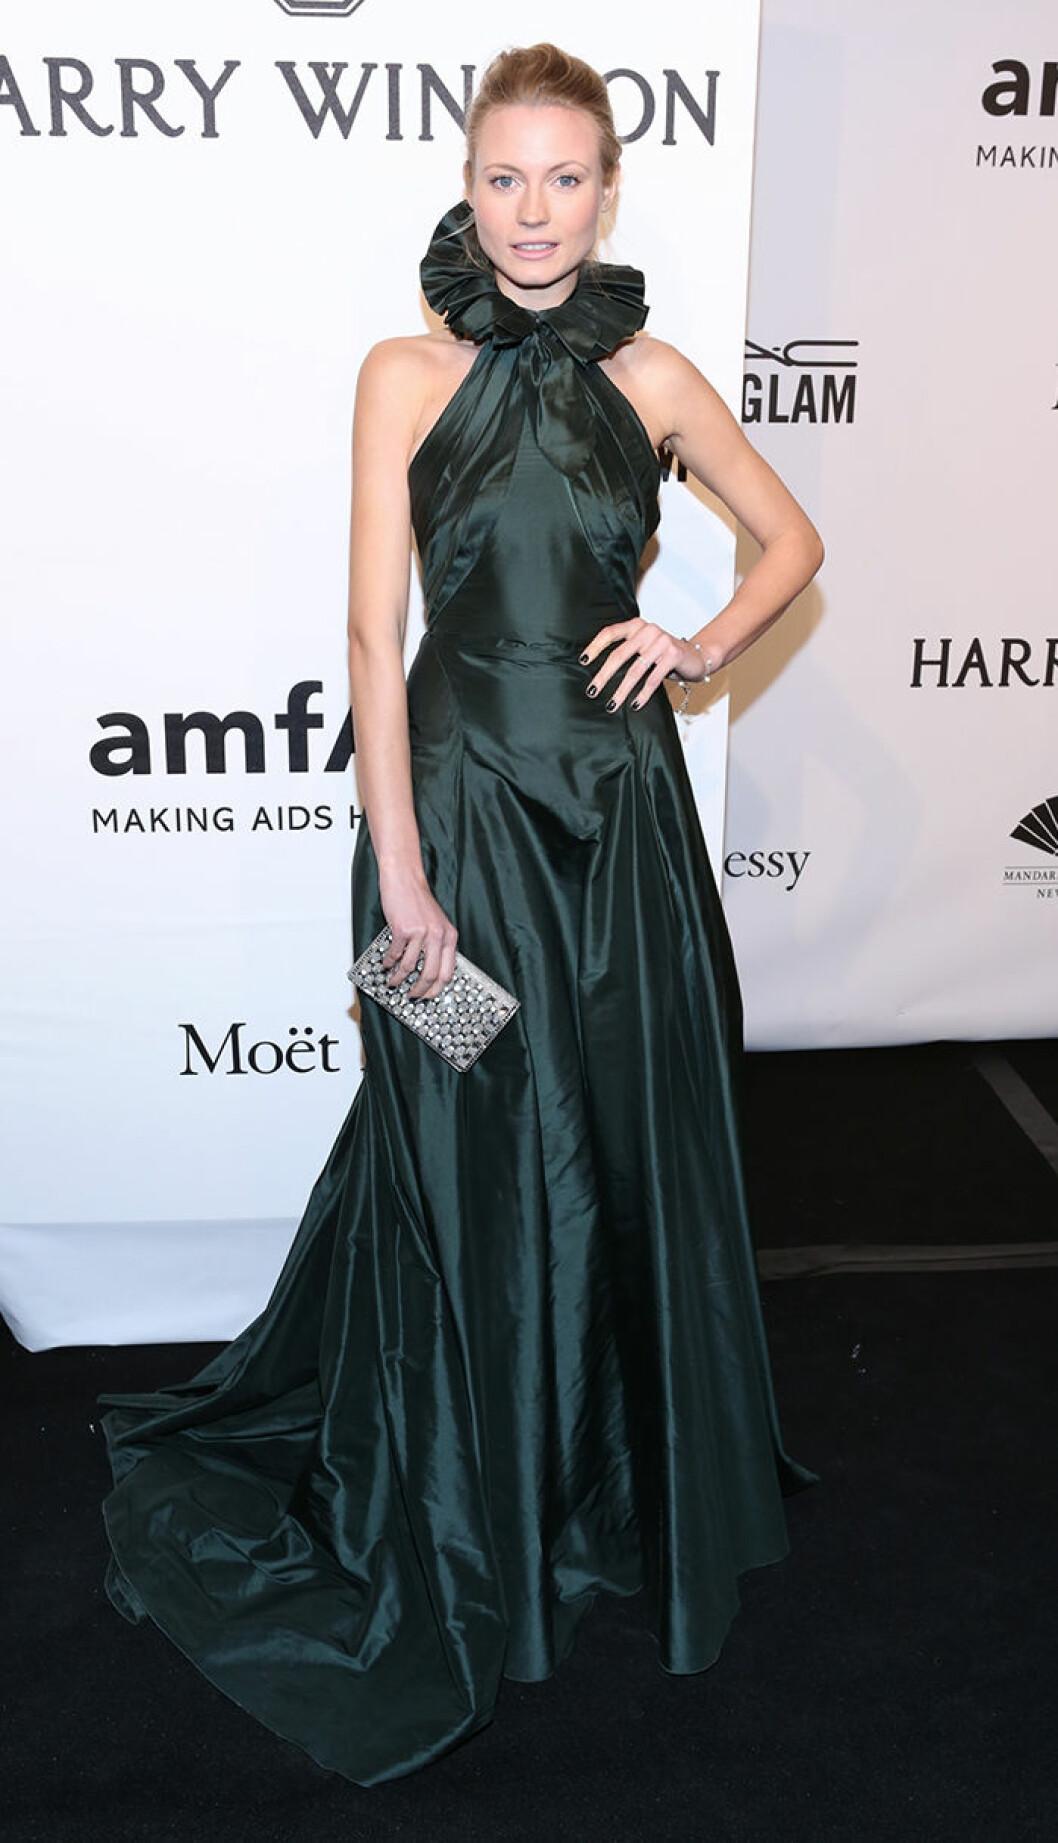 Charlotte Di Calypso seen attending the 2015 amfAR New York Gala at Cipriani Wall Street